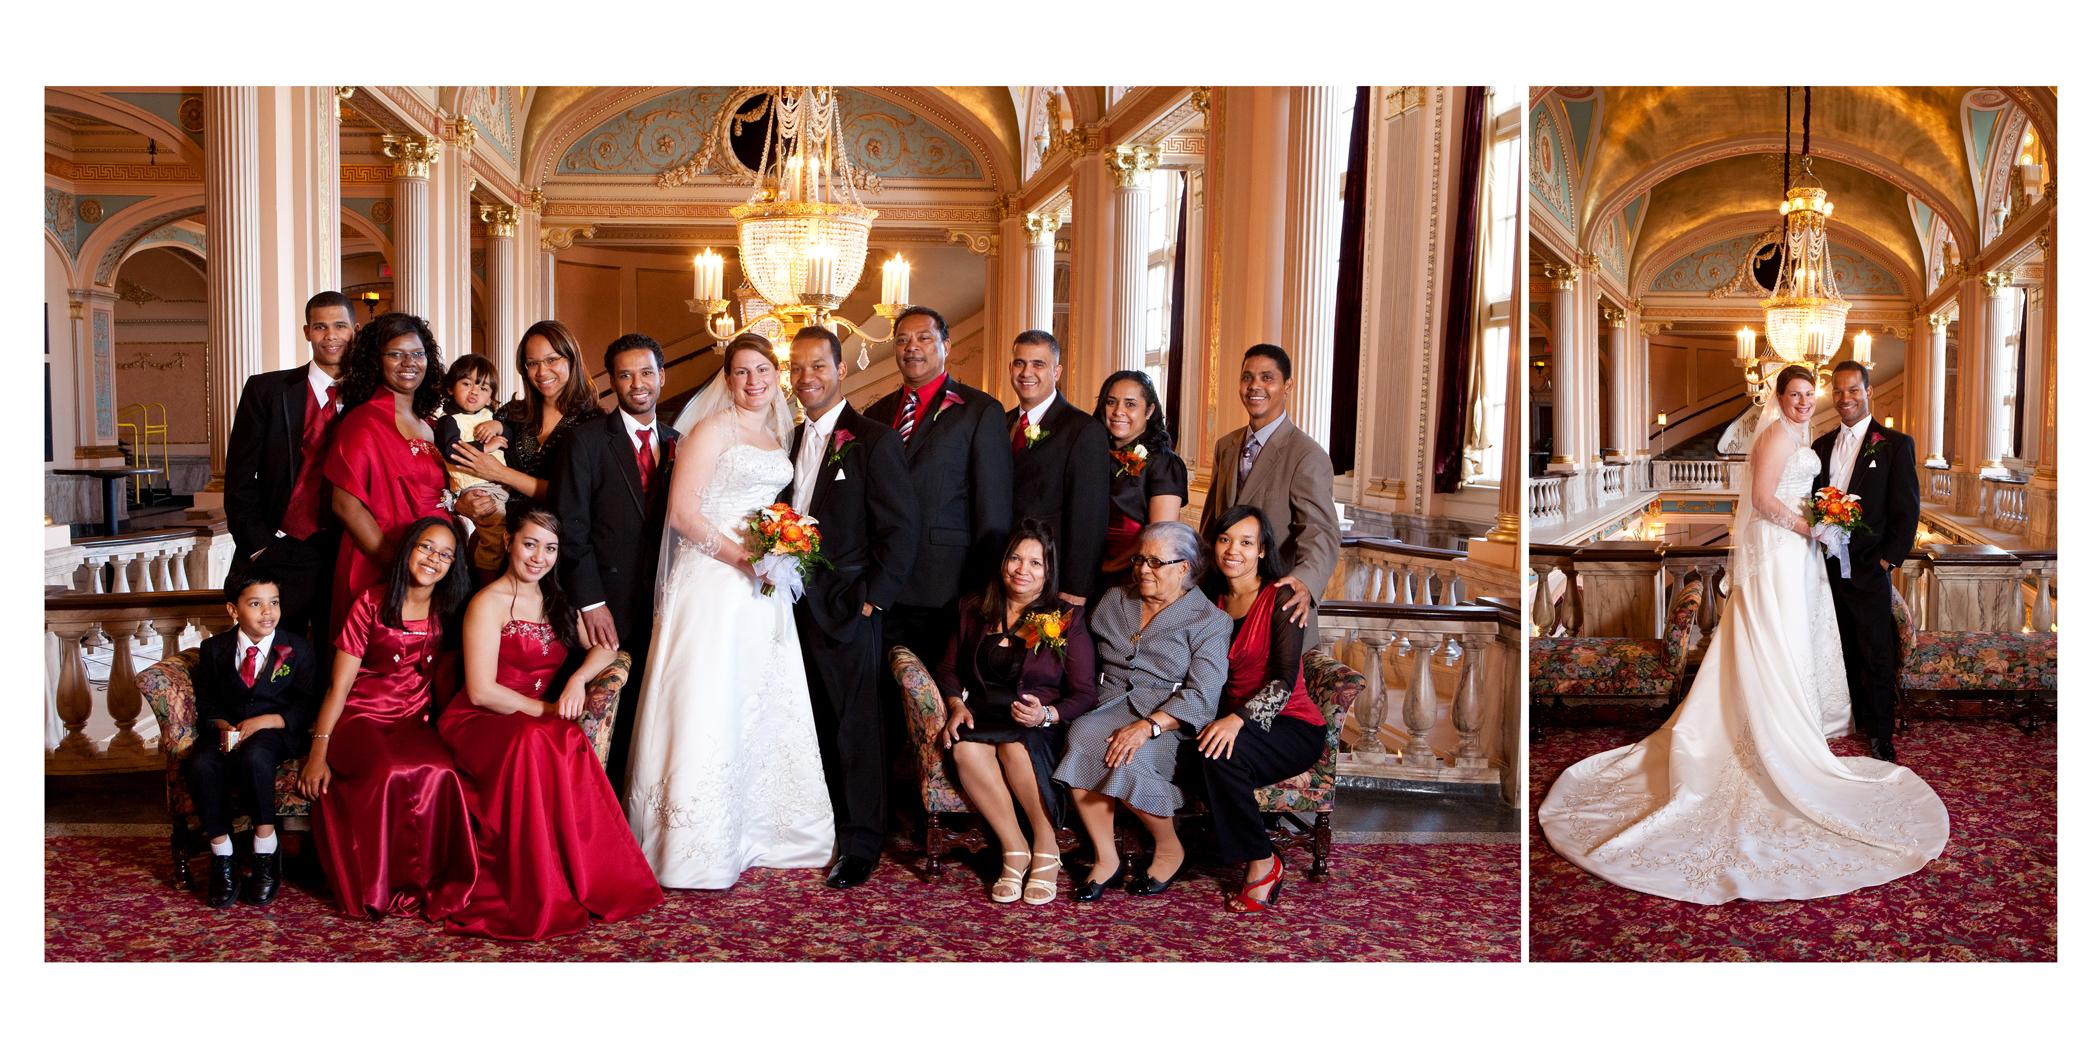 Wedding-Photography-Palaise-Royale-South-Bend-Indiana_27.jpg